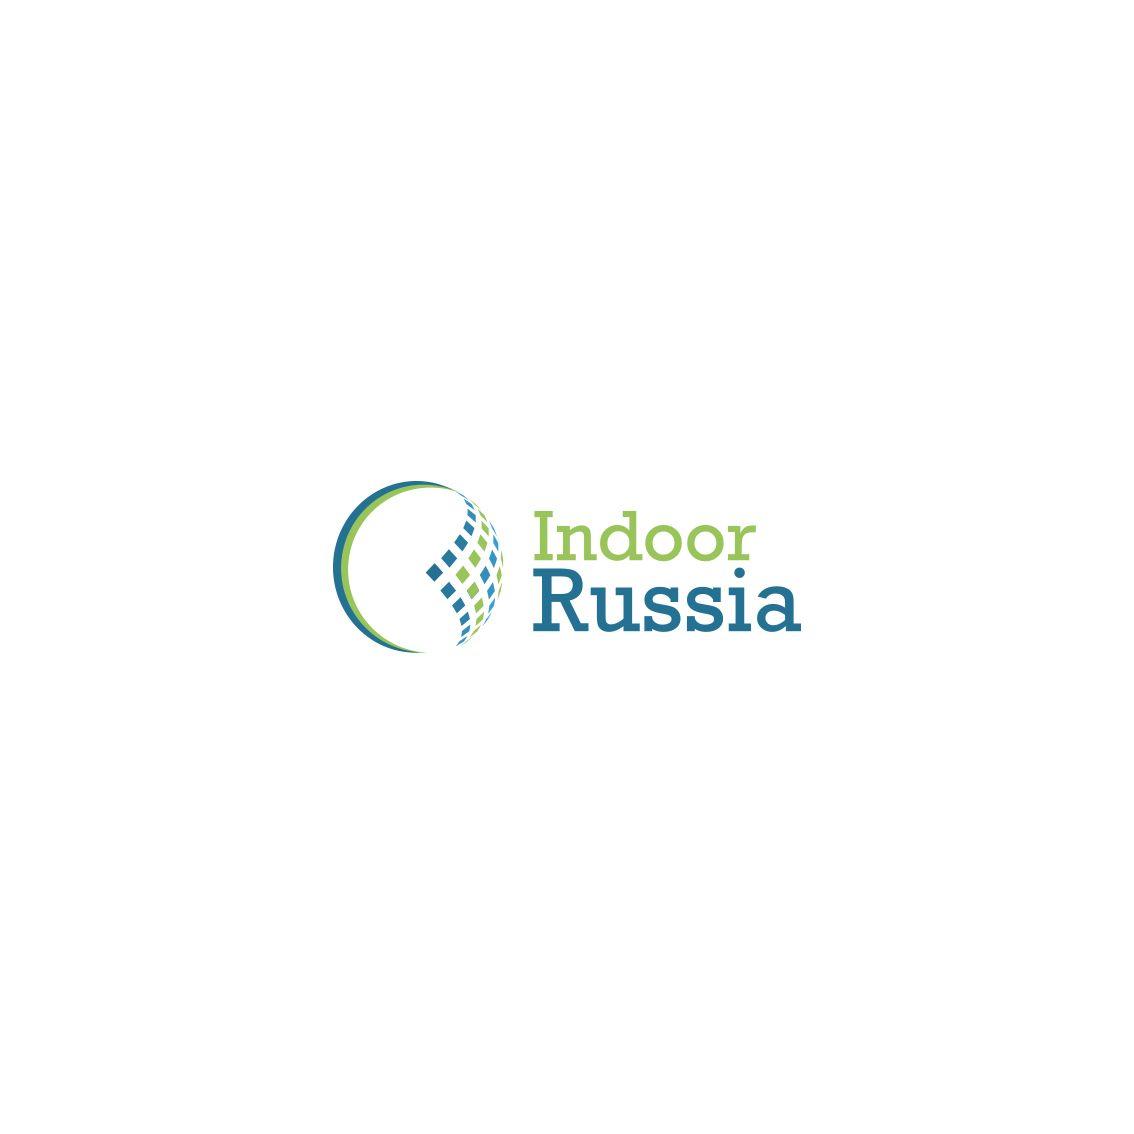 Логотип для рекламного агентства Indoor Russia - дизайнер mkravchenko